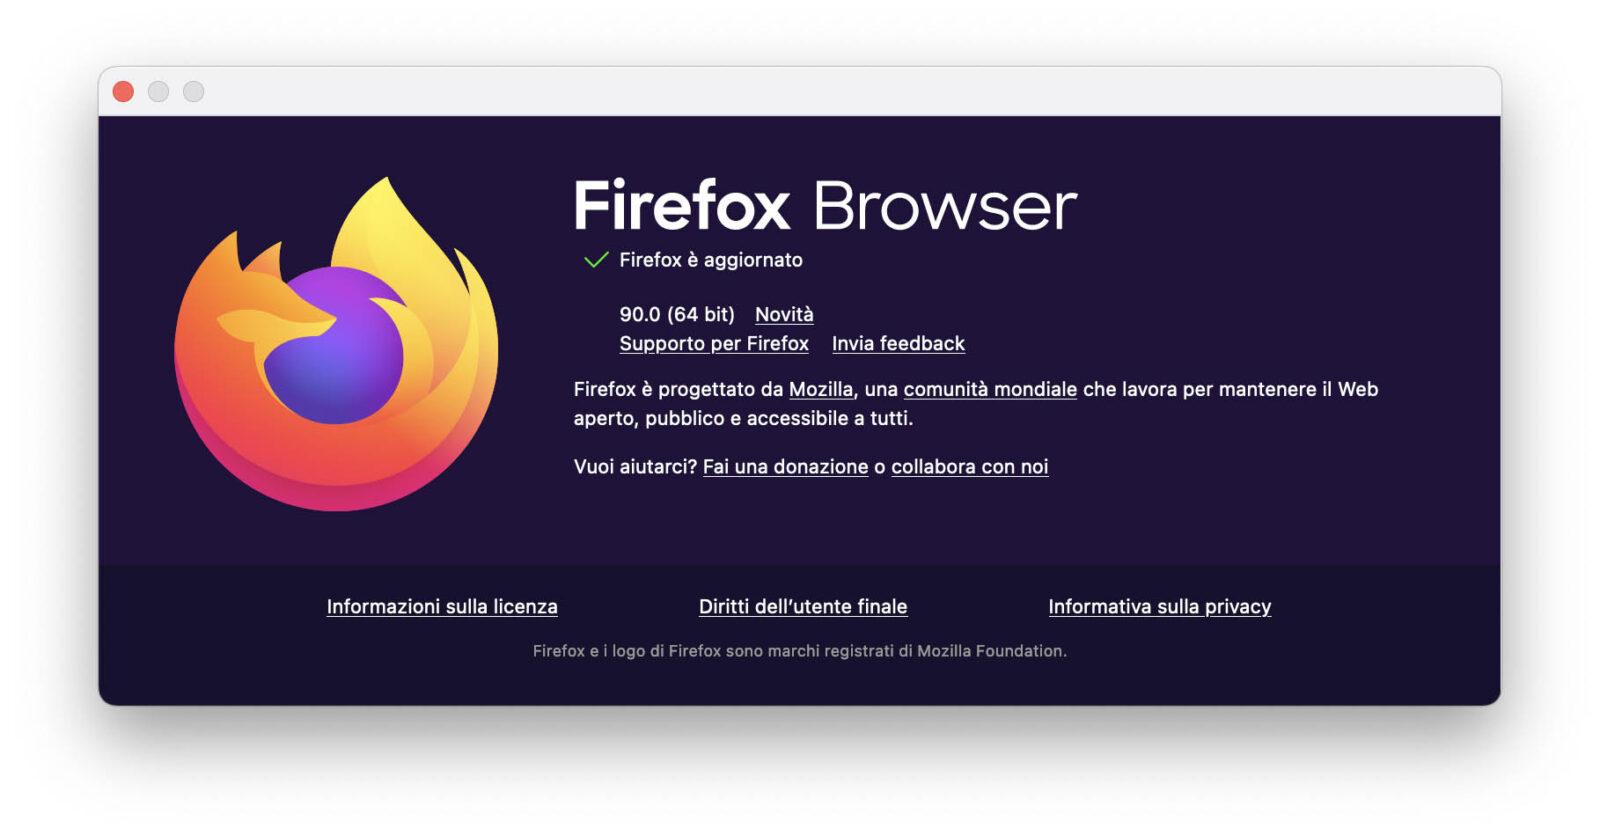 Firefox 90 impedisce a terze parti il tracking con Facebook